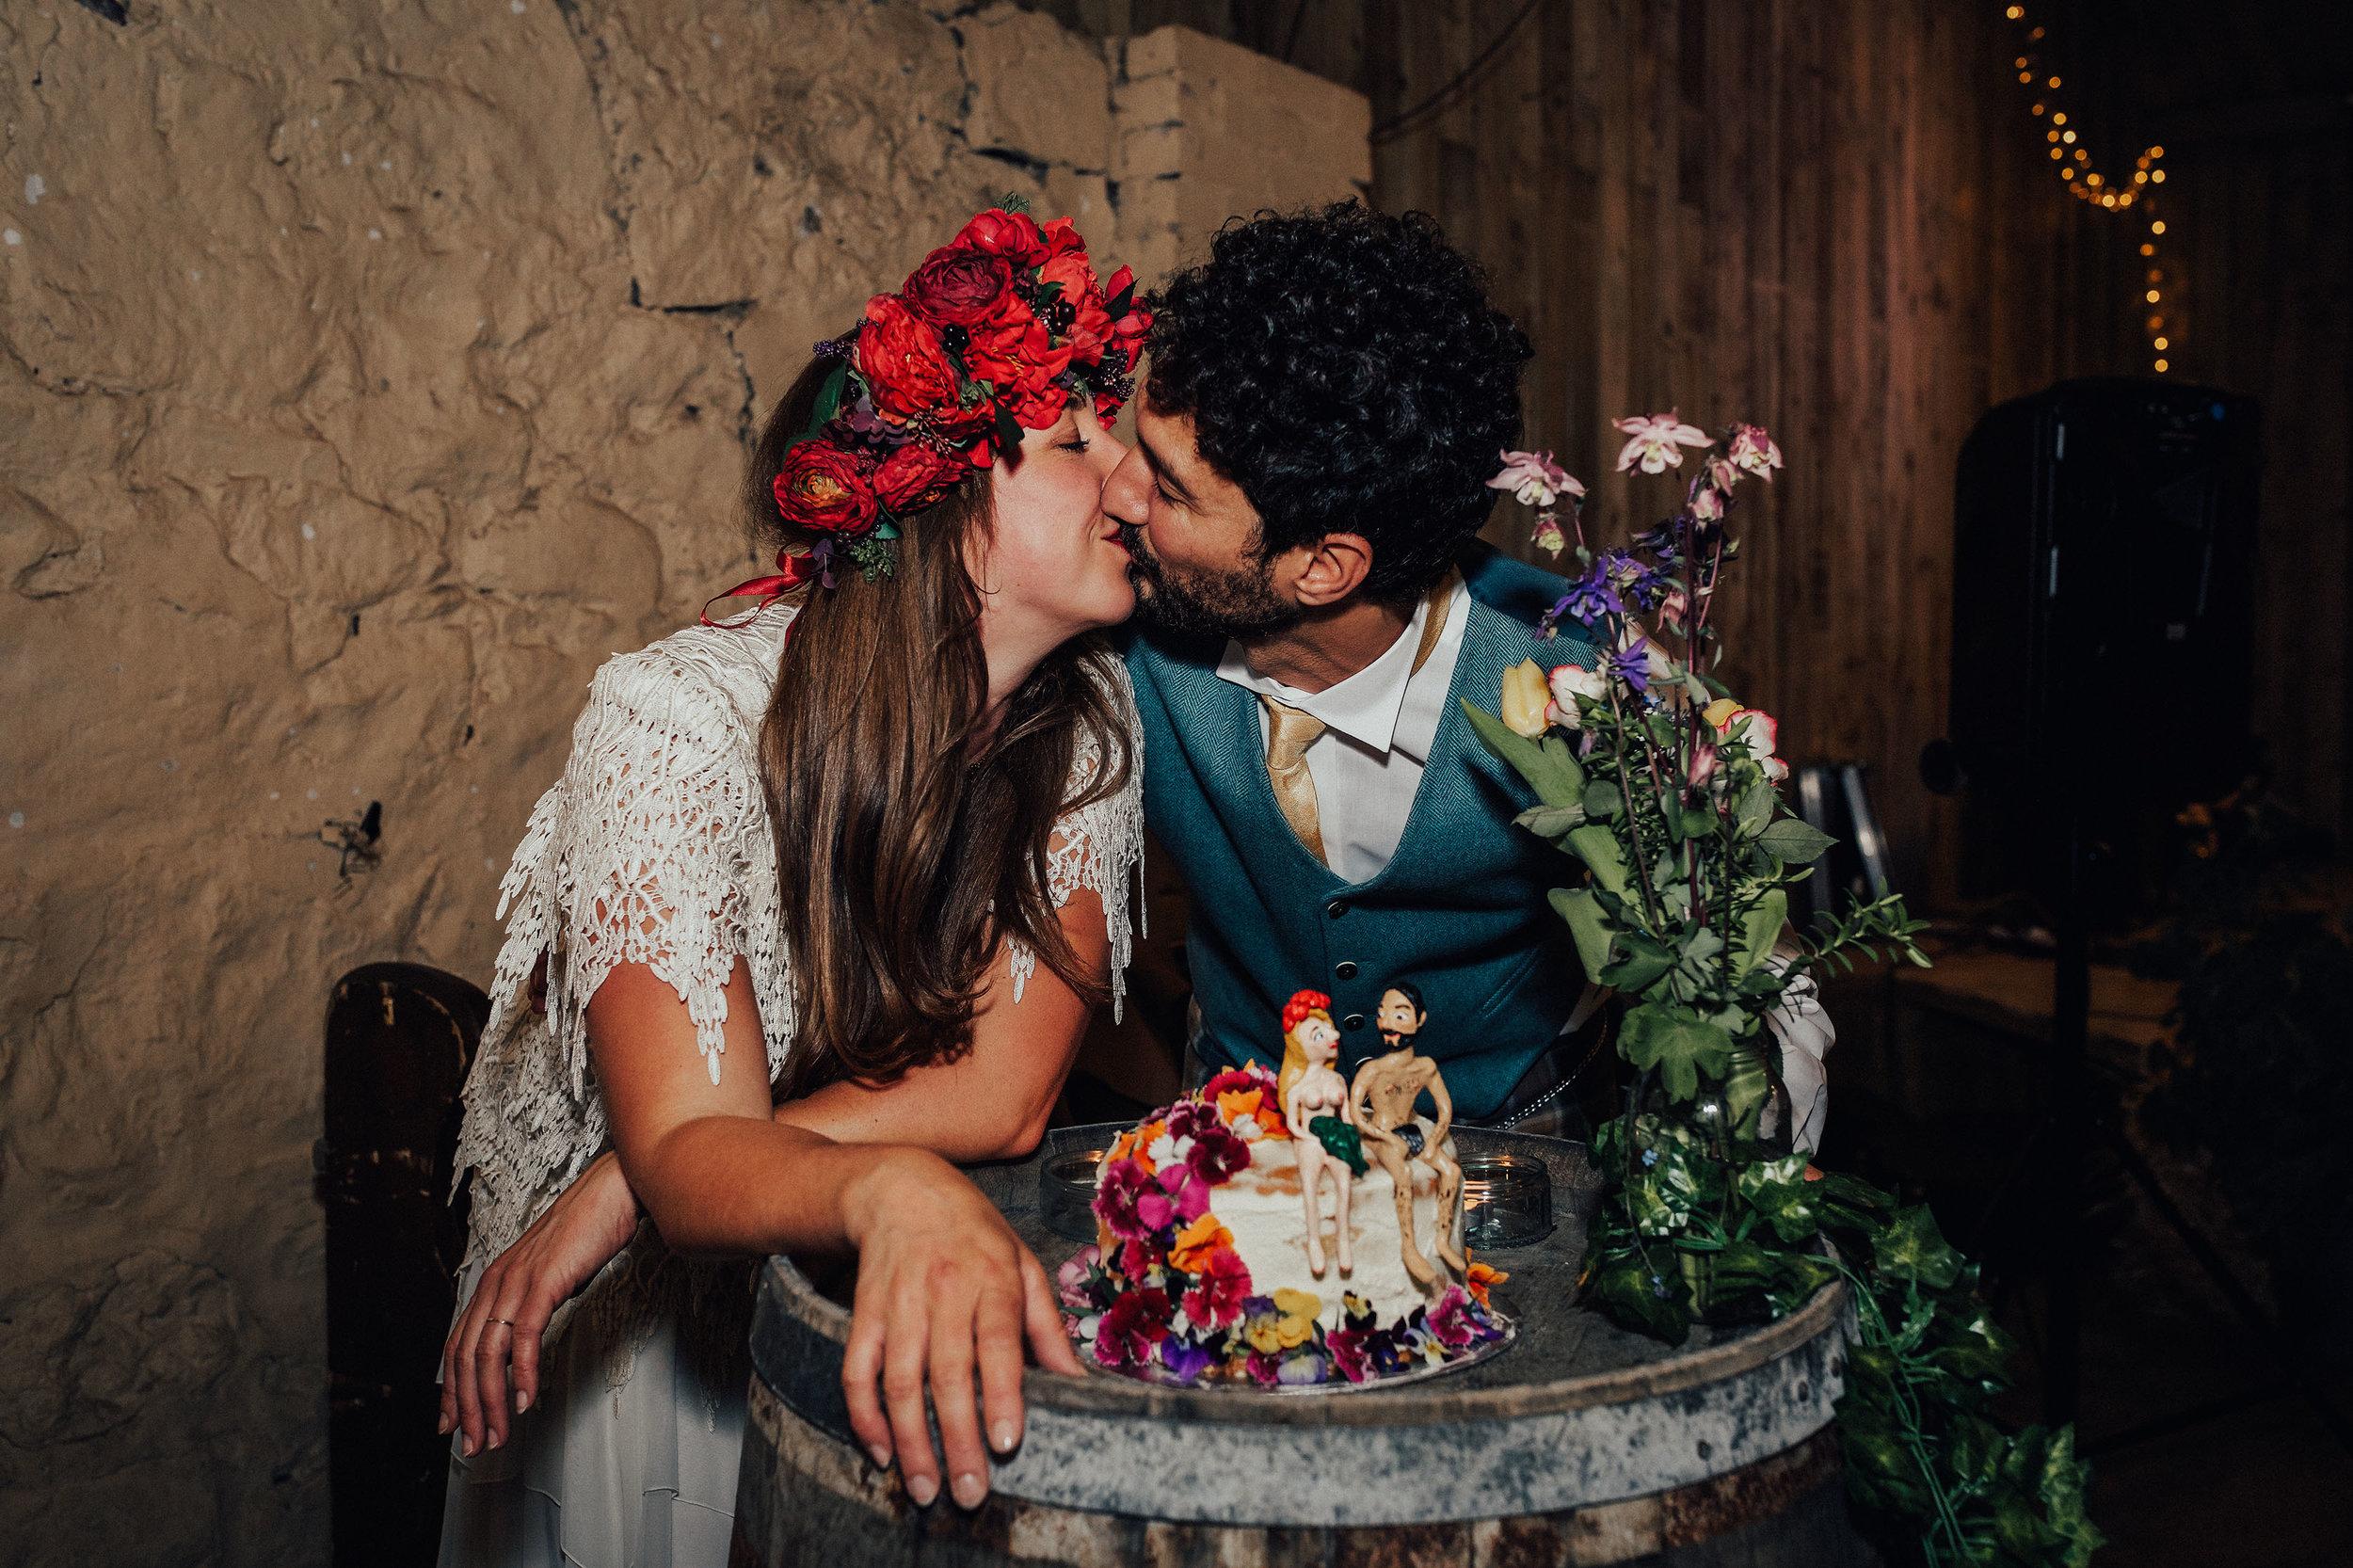 COMRIE_CROFT_WEDDINGS_PJ_PHILLIPS_PHOTOGRAPHY_203.jpg